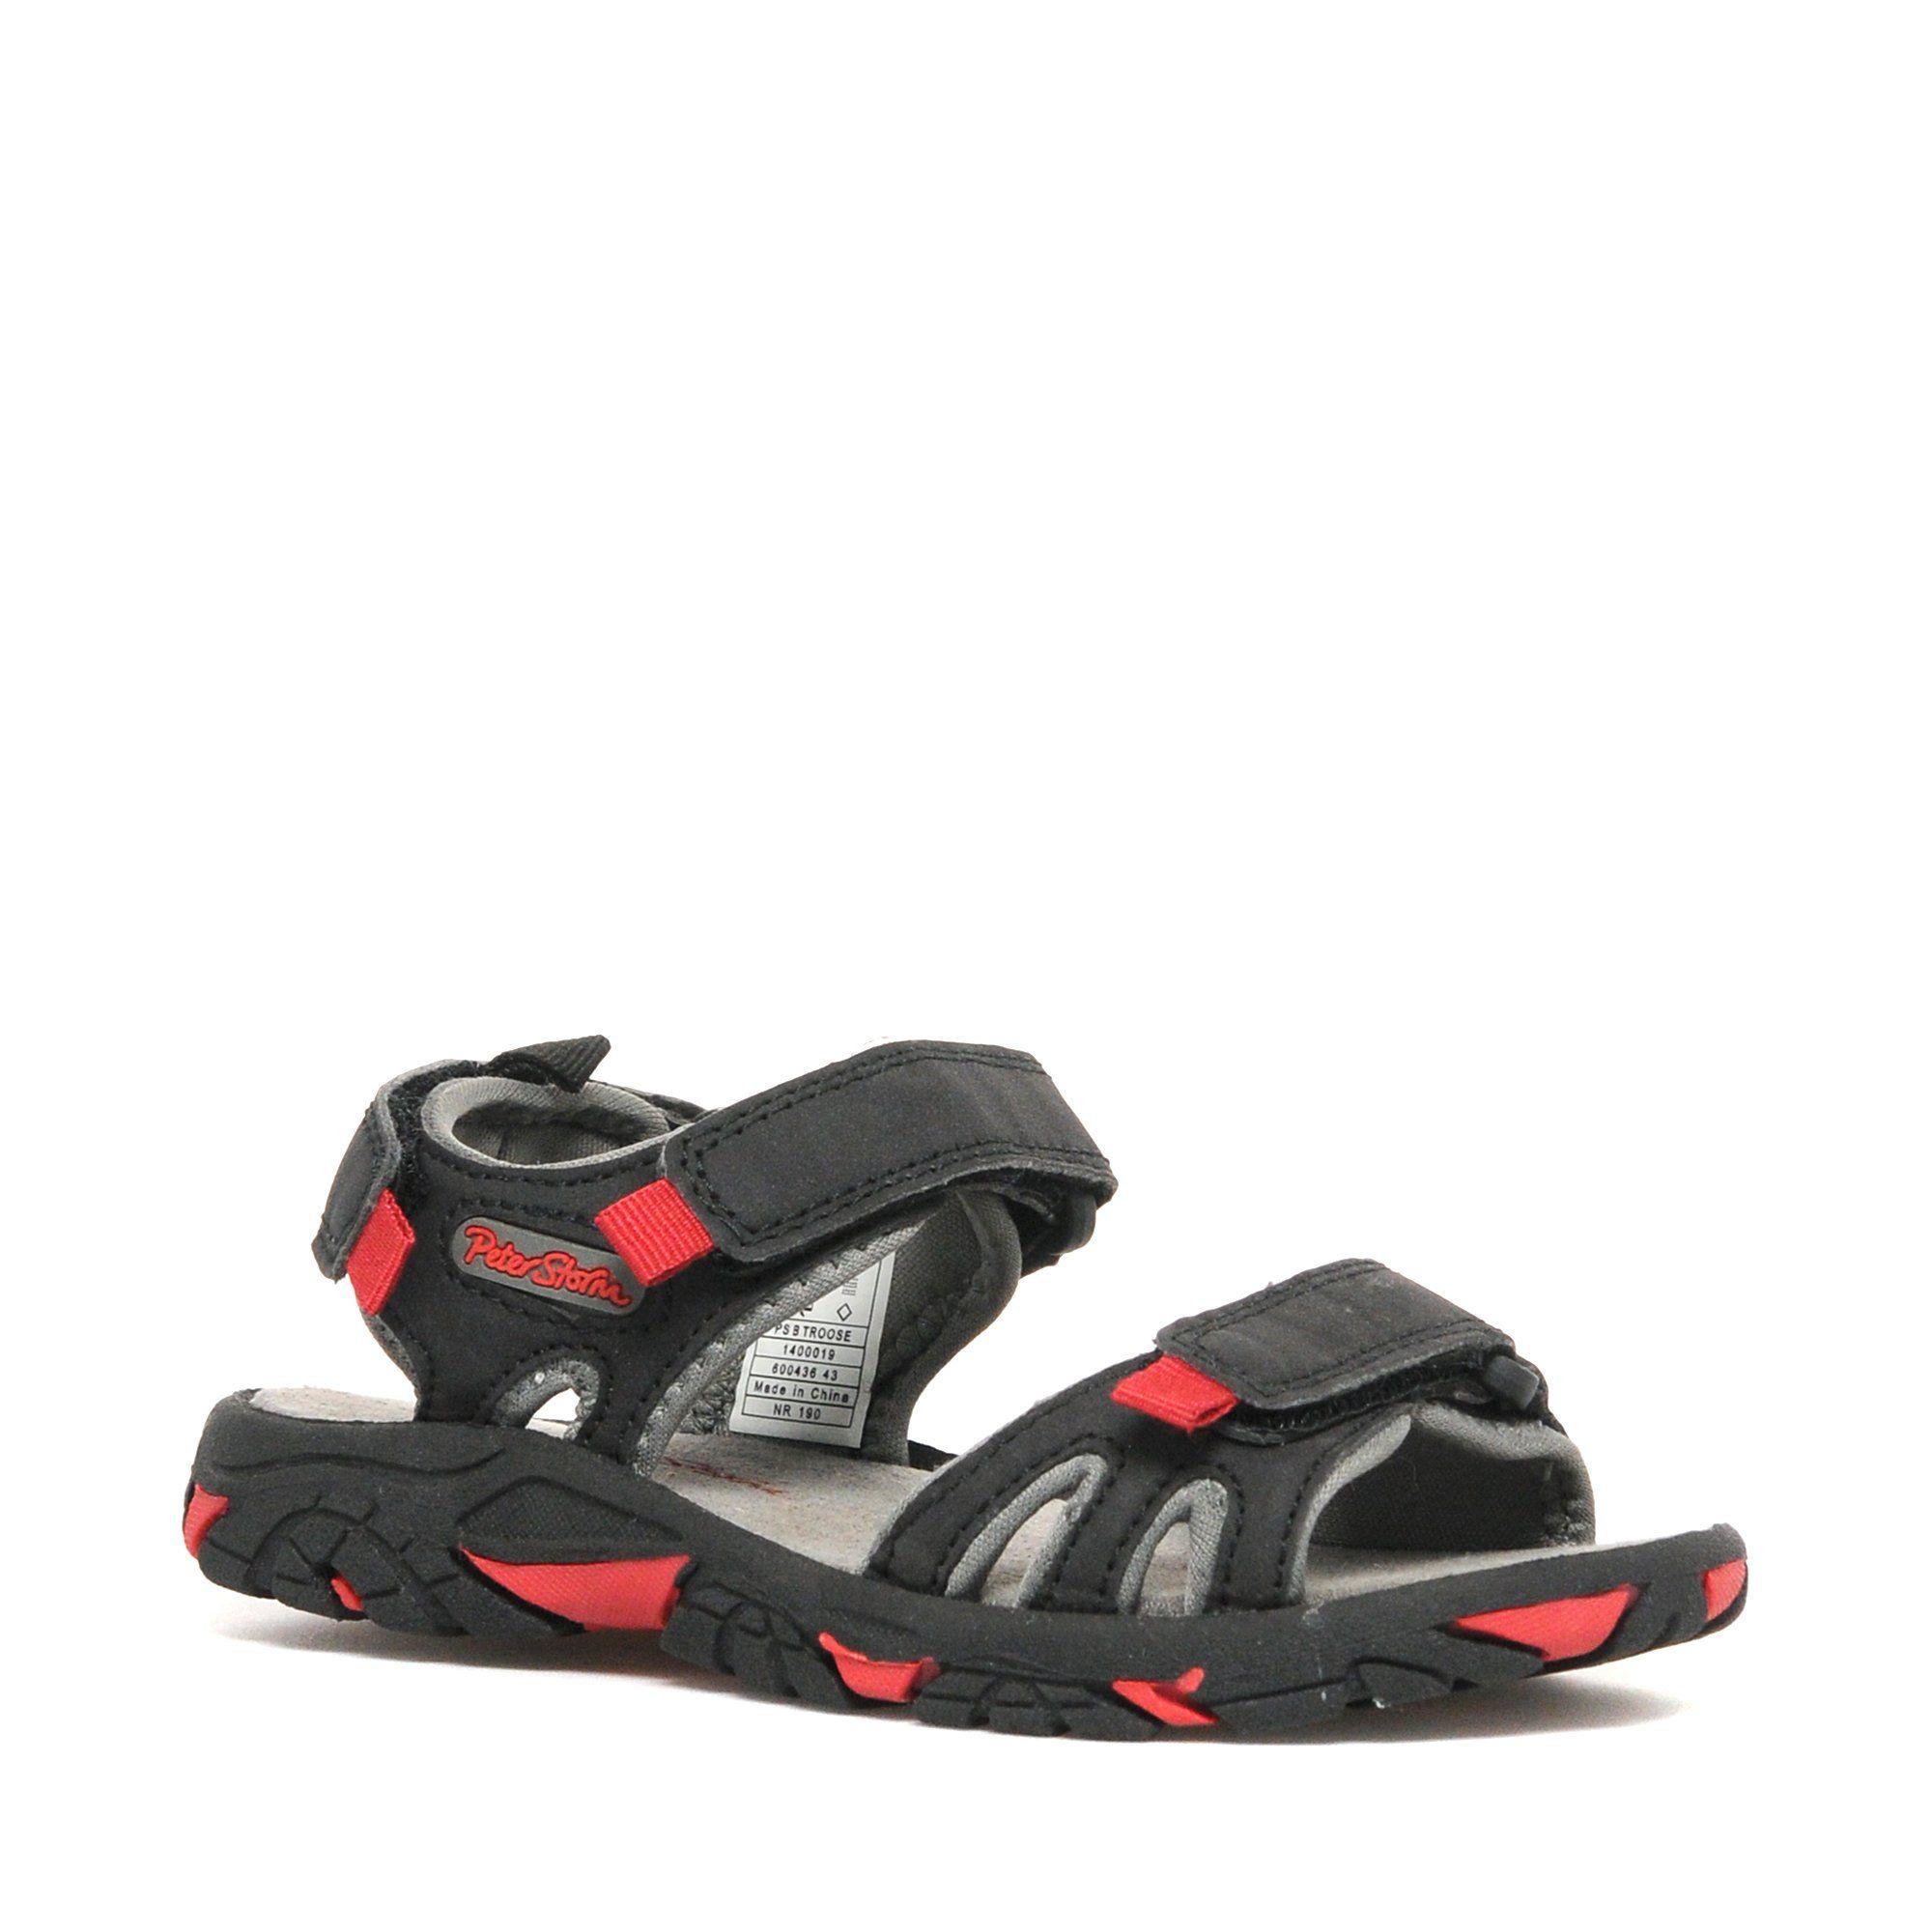 PETER STORM Boy's Troose Sandals